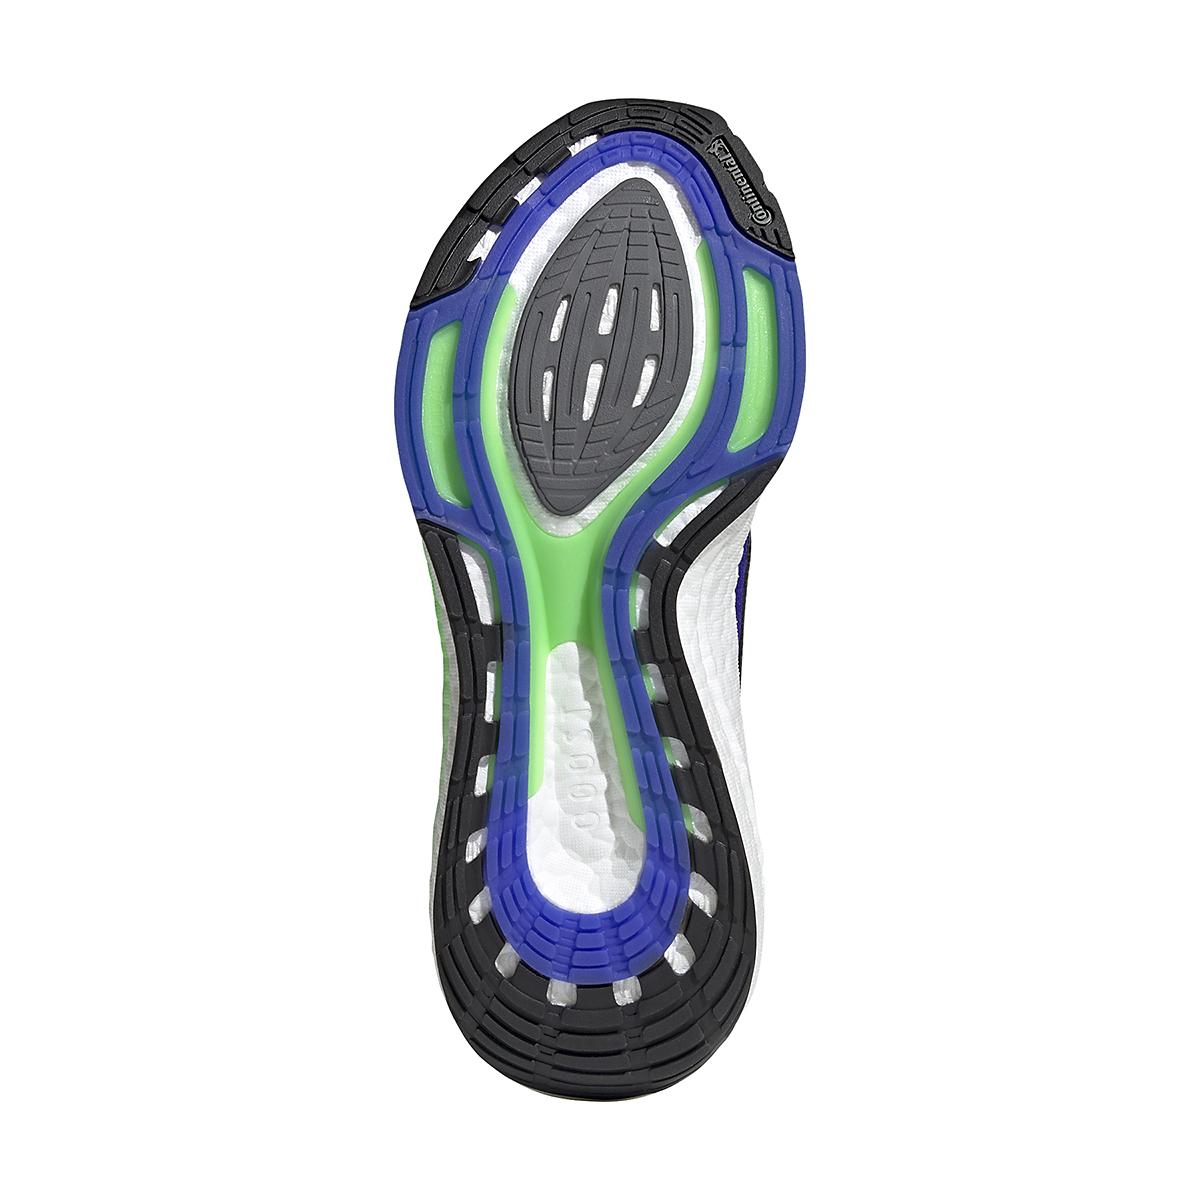 Men's Adidas UltraBOOST 21 Running Shoe - Color: Sonic Ink/Core Black/Screaming Green - Size: 6 - Width: Regular, Sonic Ink/Core Black/Screaming Green, large, image 7